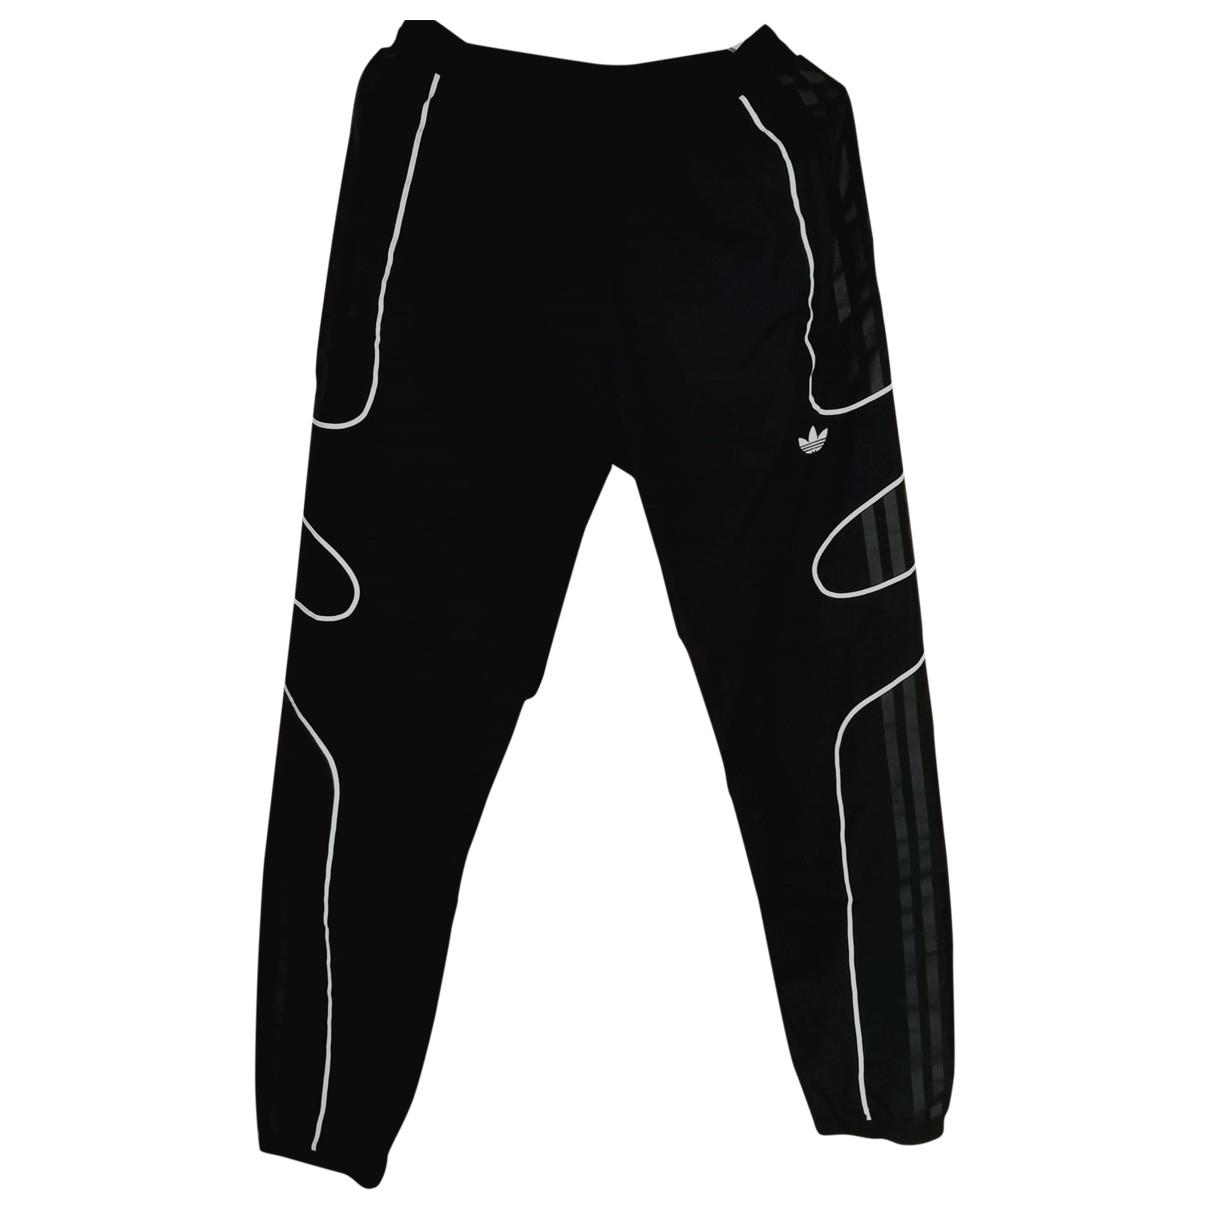 Adidas N Black Trousers for Men S International